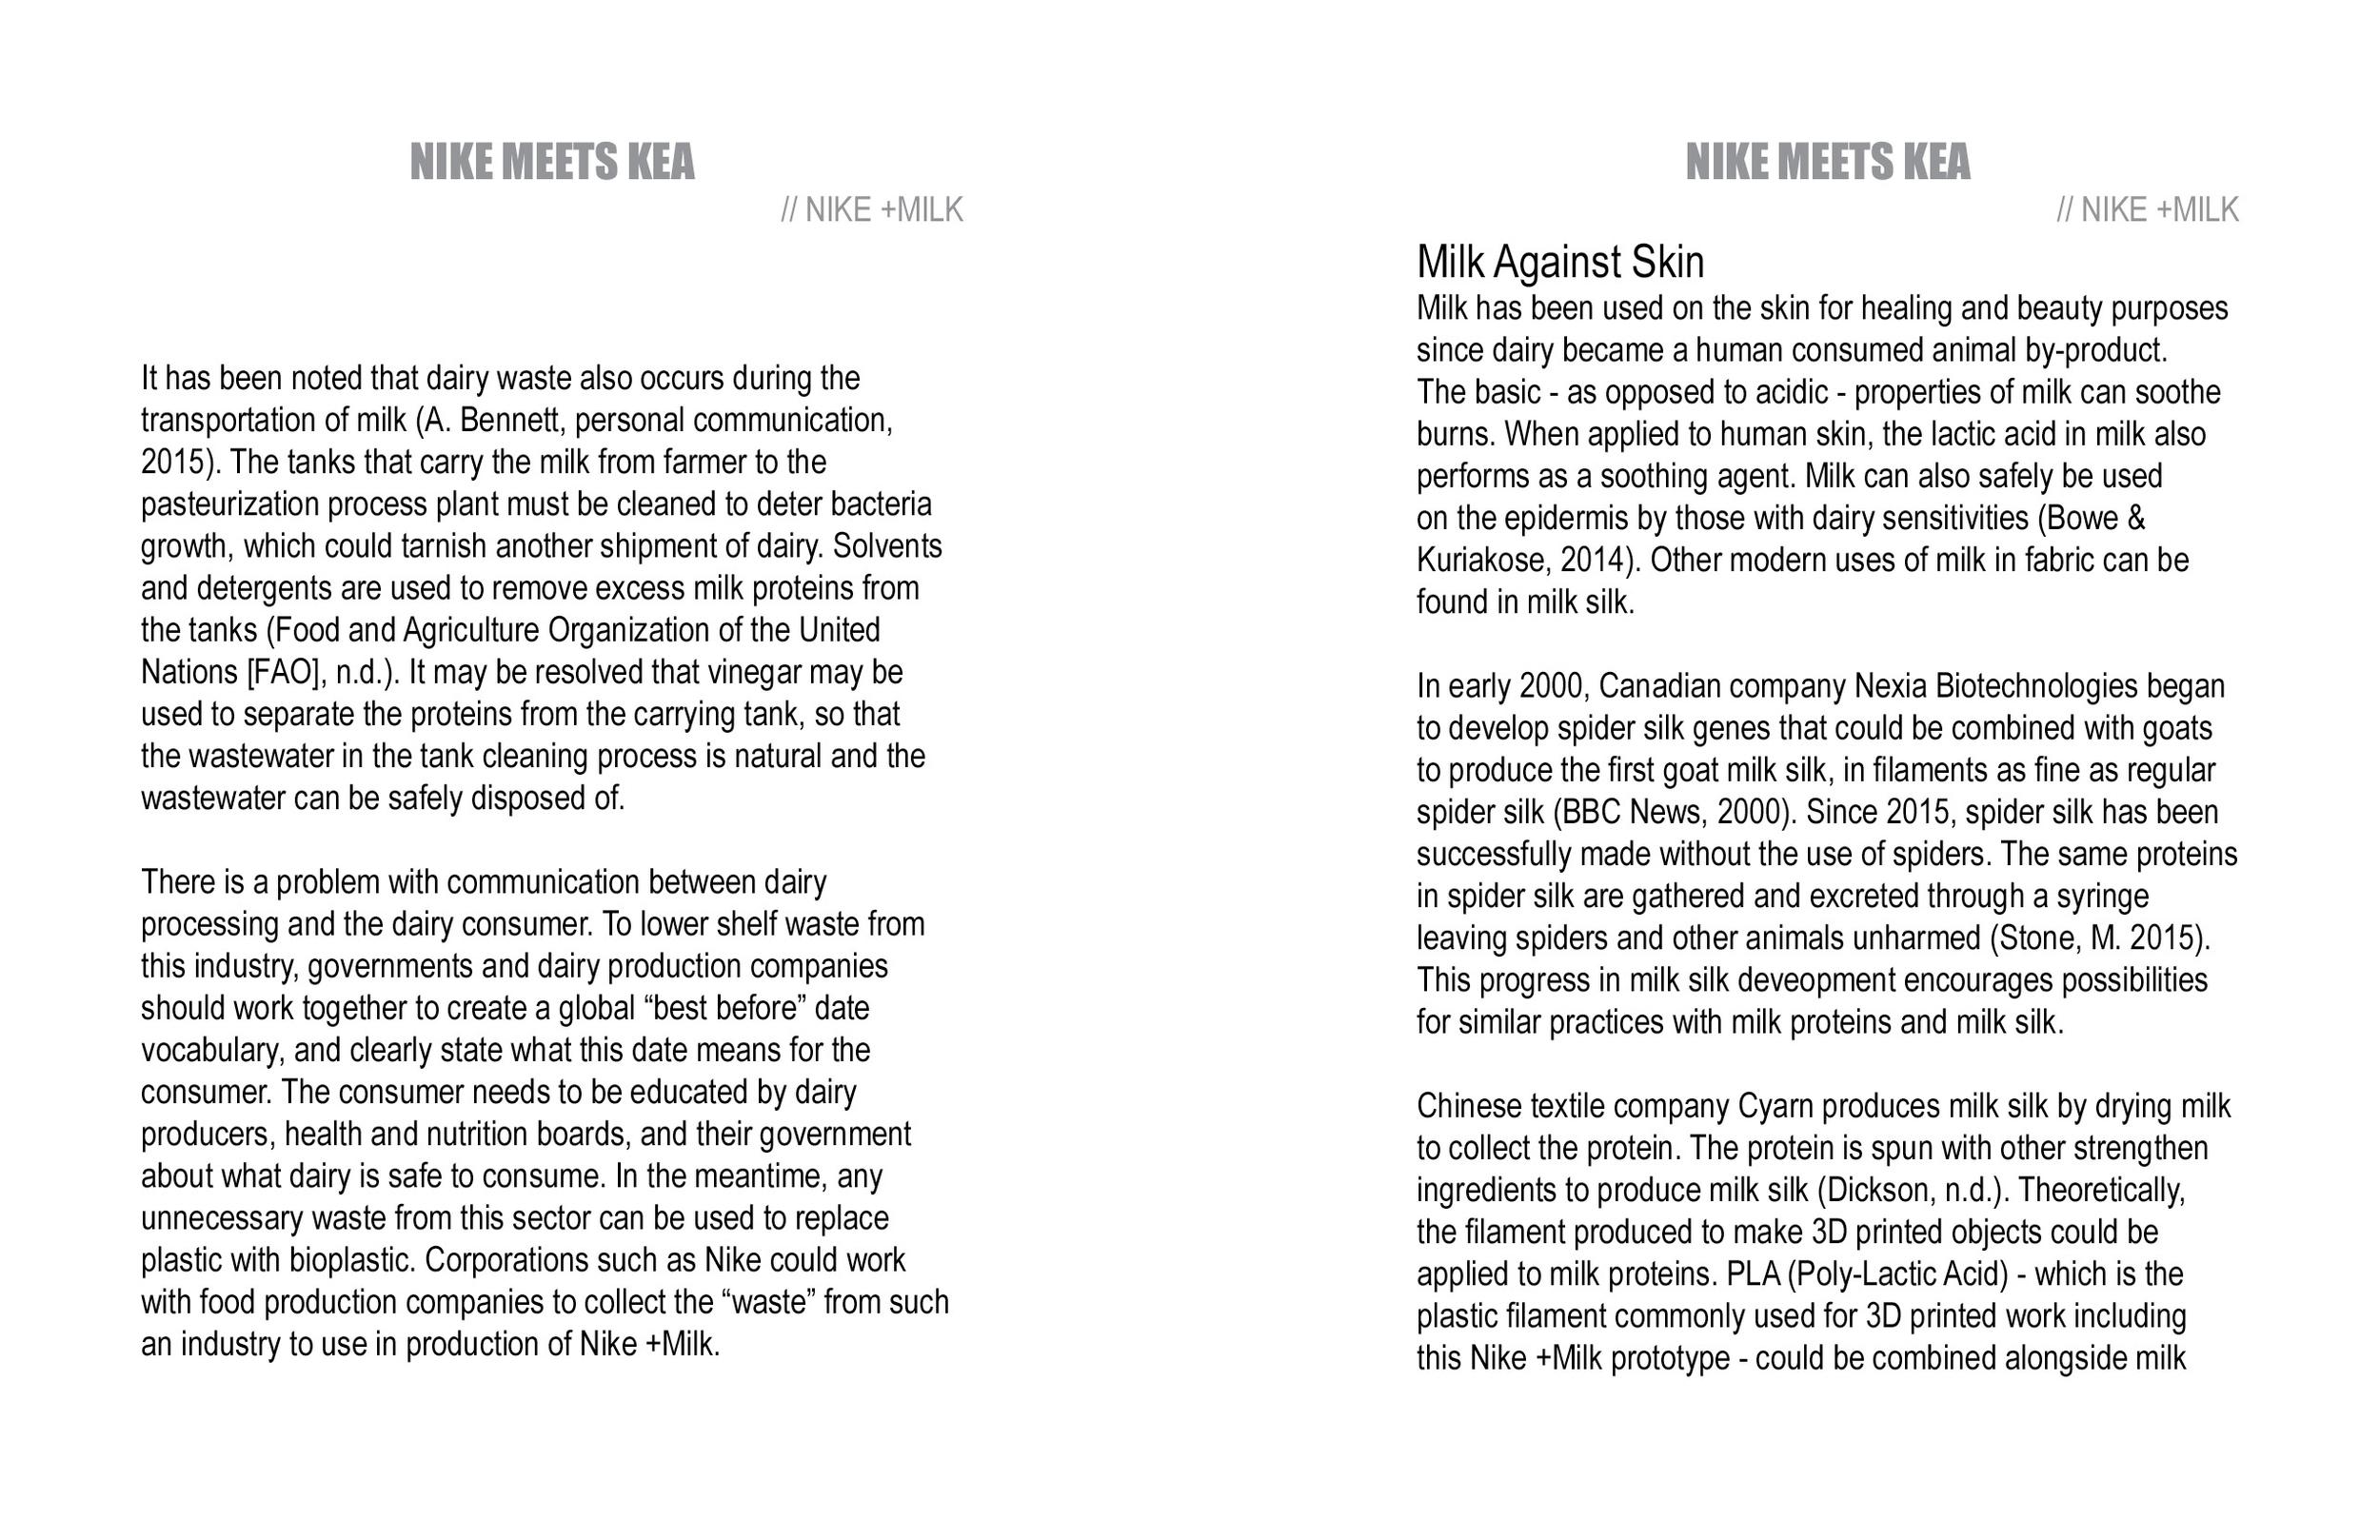 Nike +Milk process book for eebdesign4.jpg